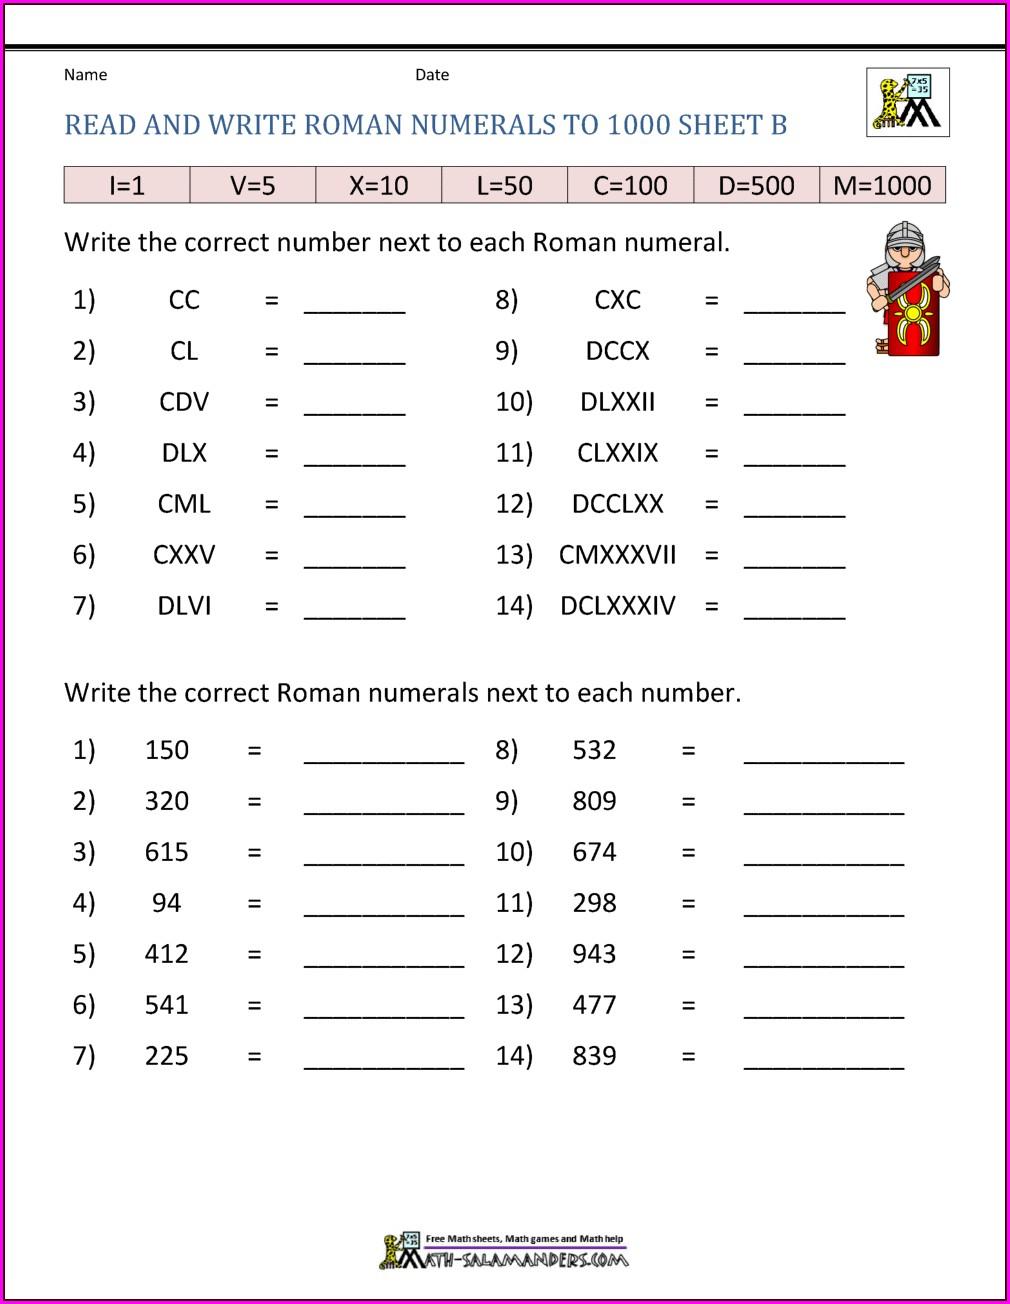 Roman Numerals Sums Worksheet